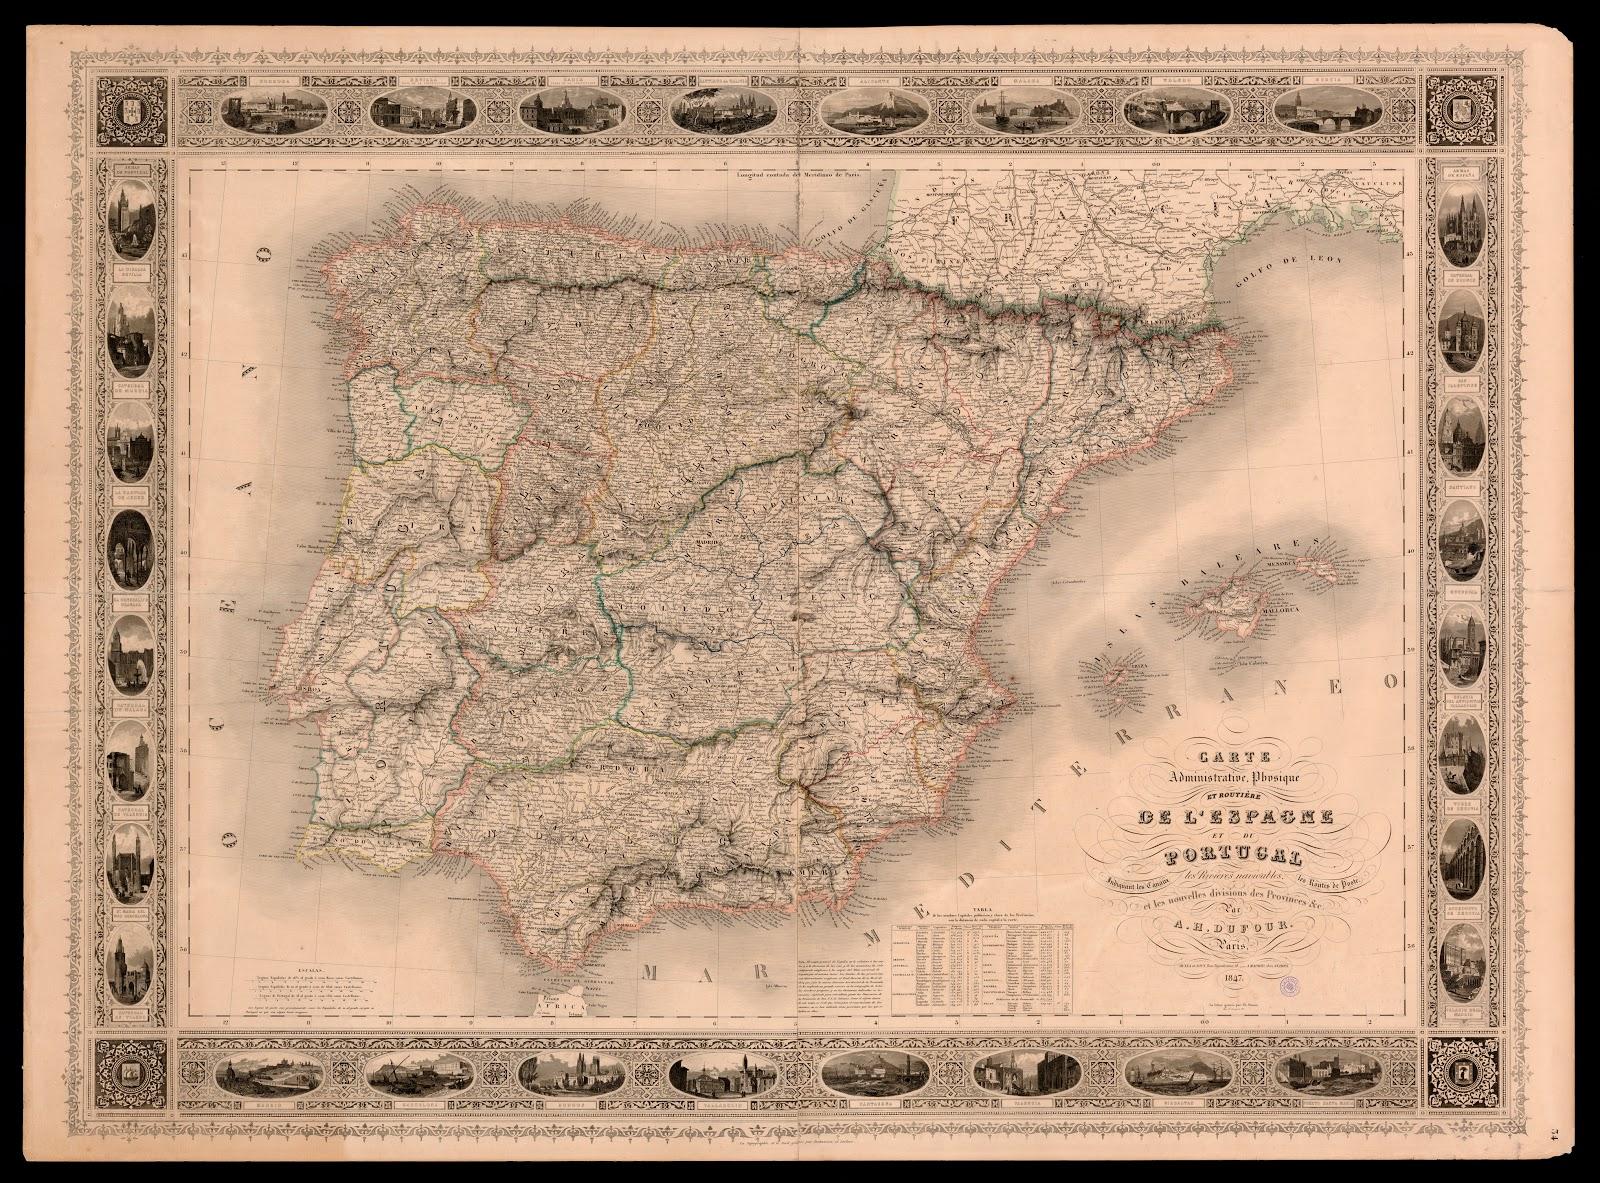 Henri Dufour mapa de España y Portugal 1847